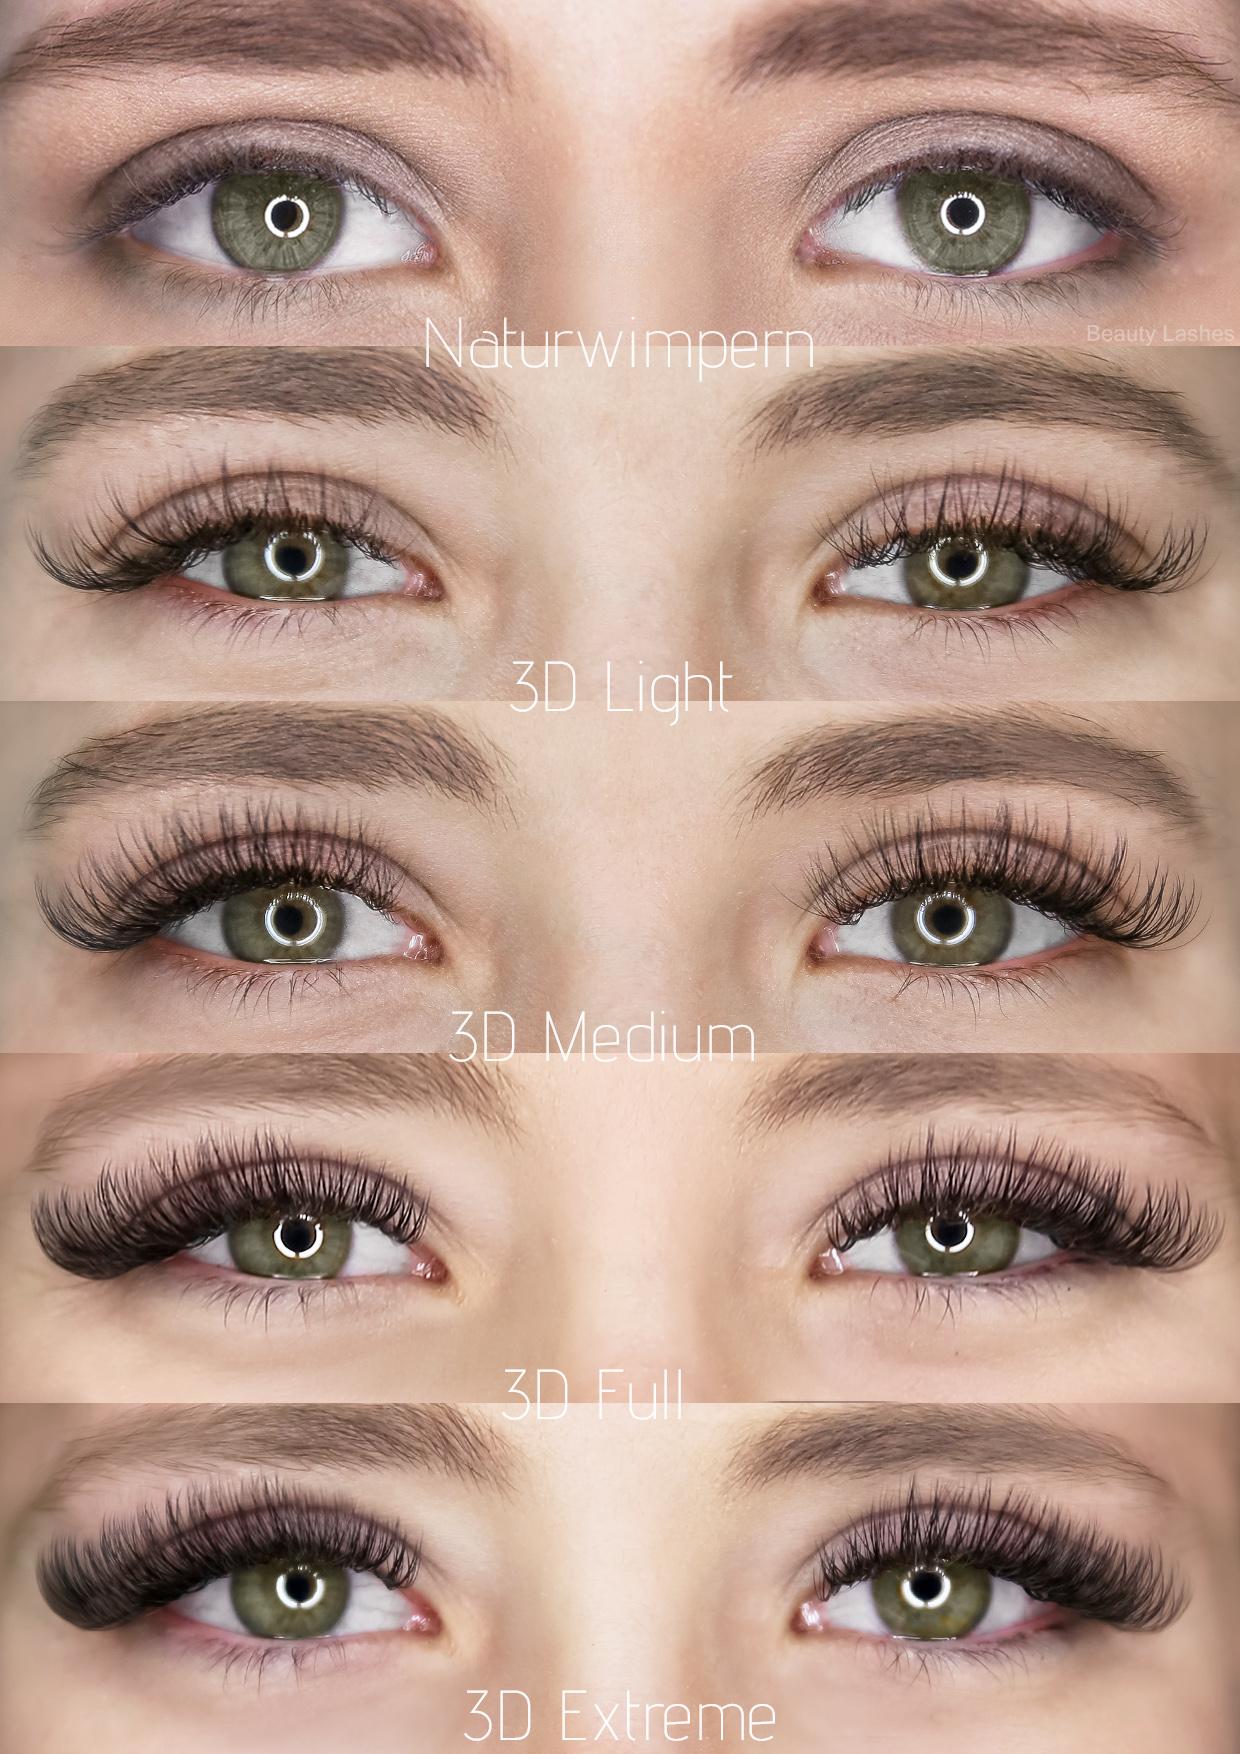 beauty-lashes-light-medium-full-extreme_heller